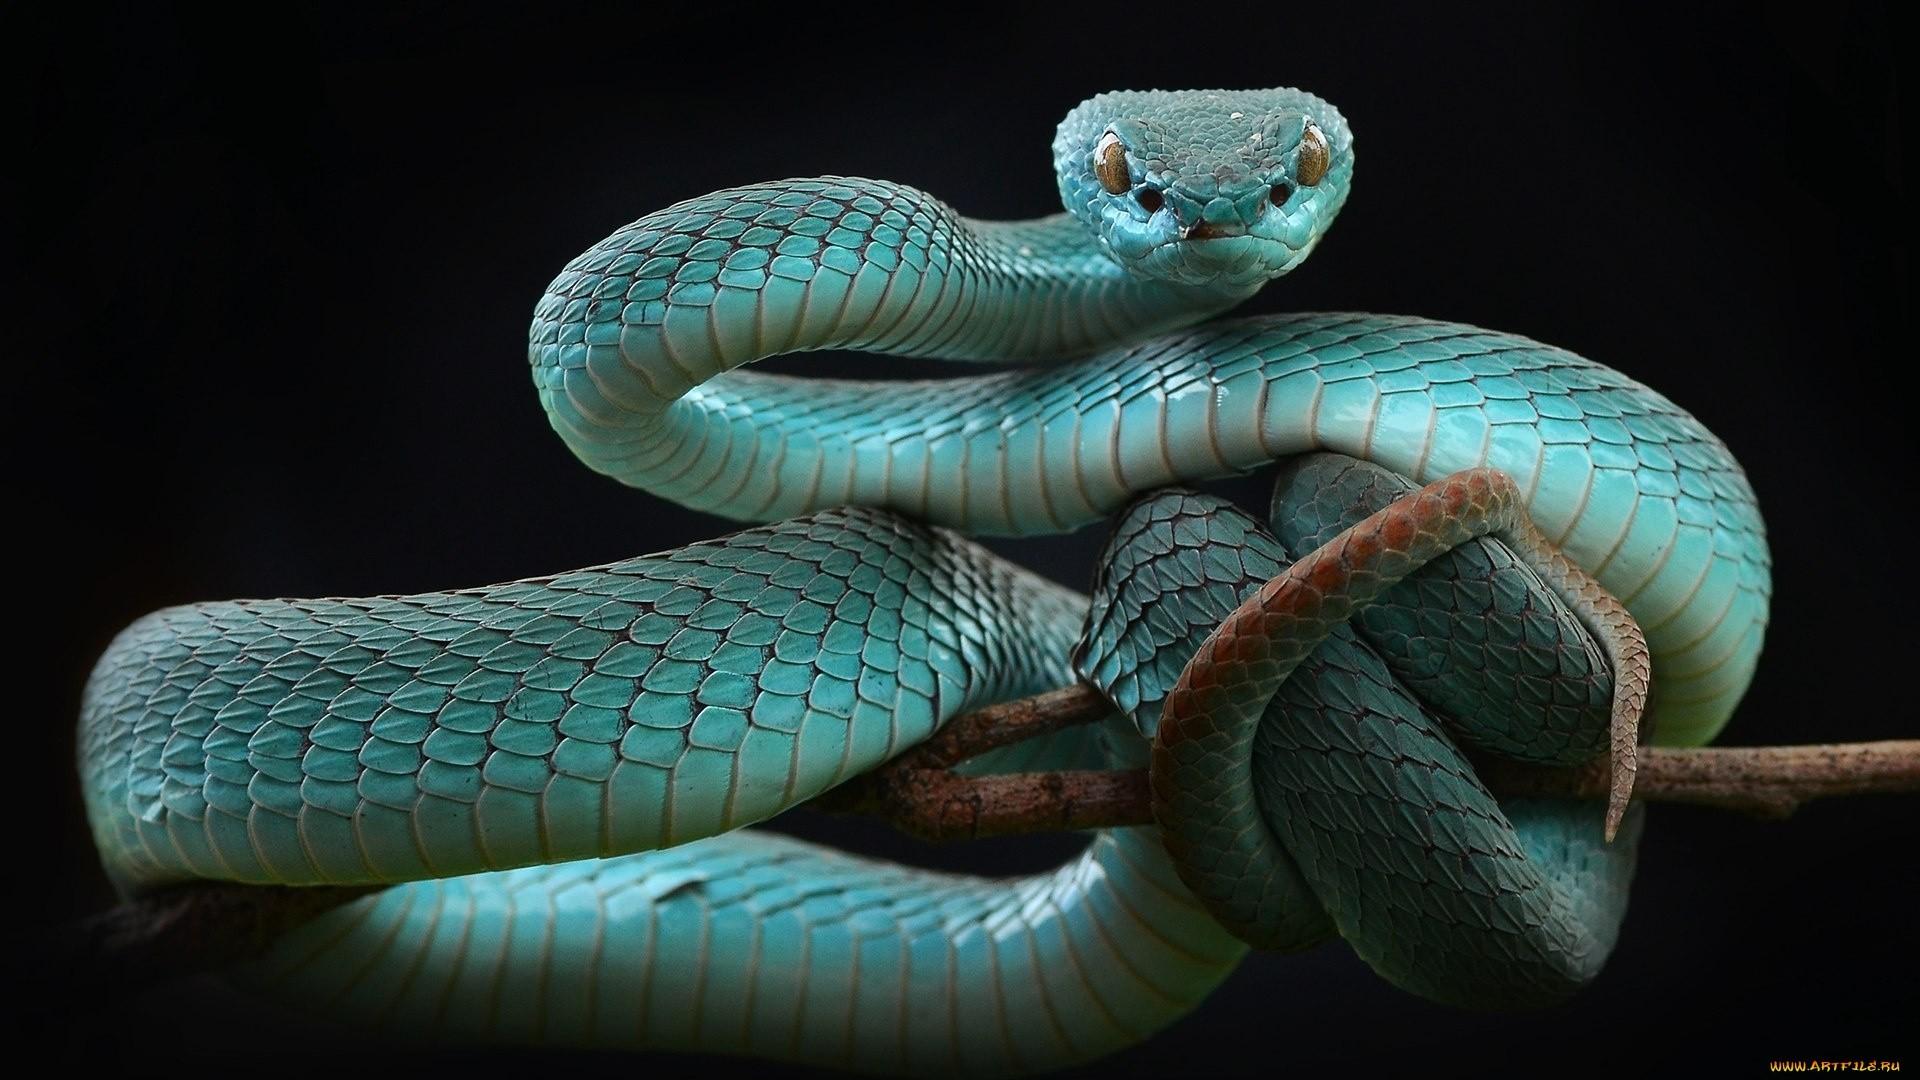 Snake Wallpaper theme